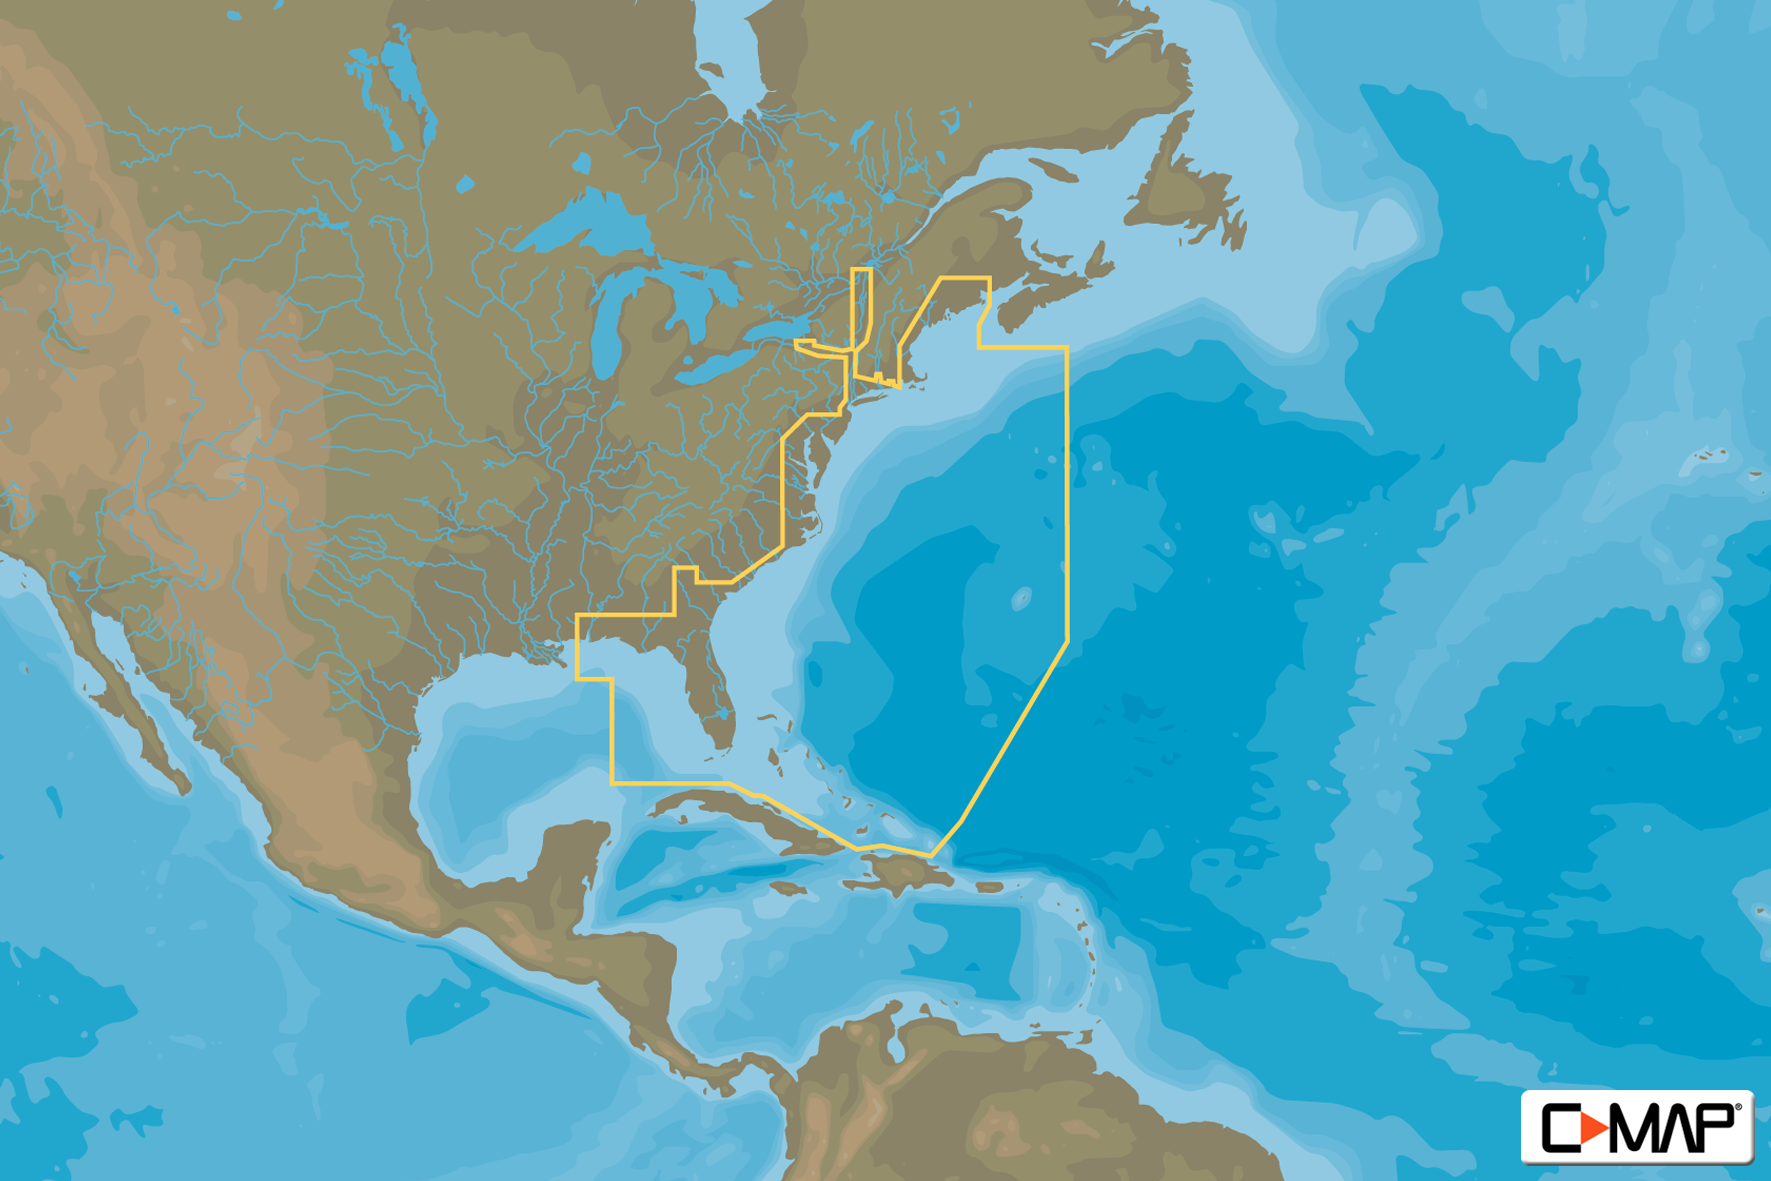 C-MAP MAX Wide - US East Coast & Bahamas